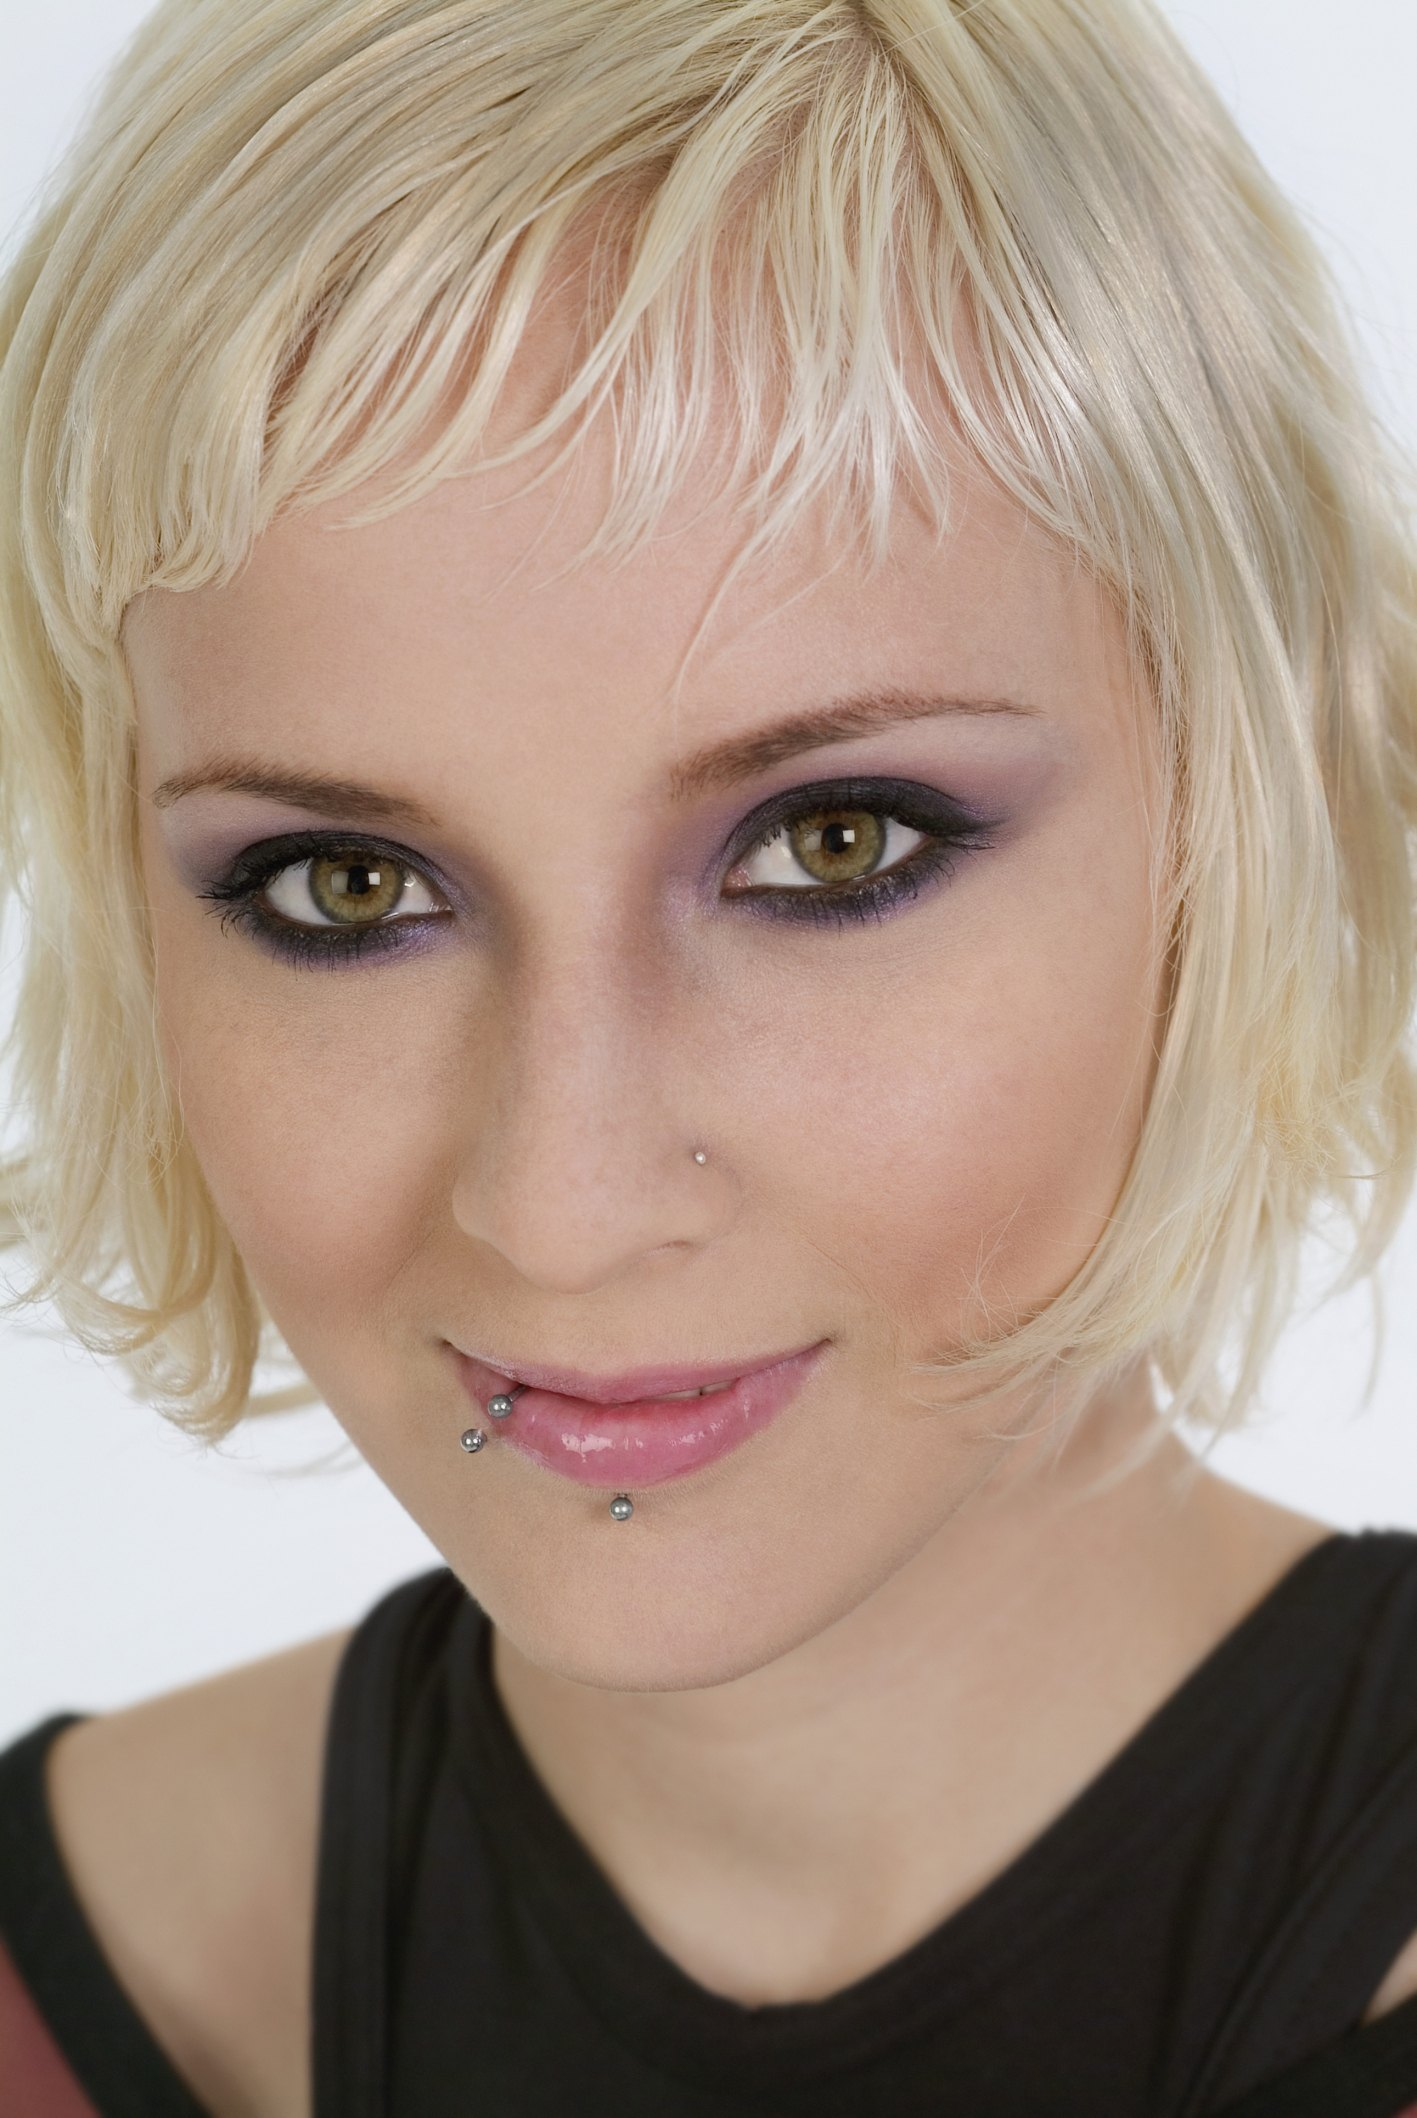 How To Get Rid Of Dark Spots Around A Lip Piercing